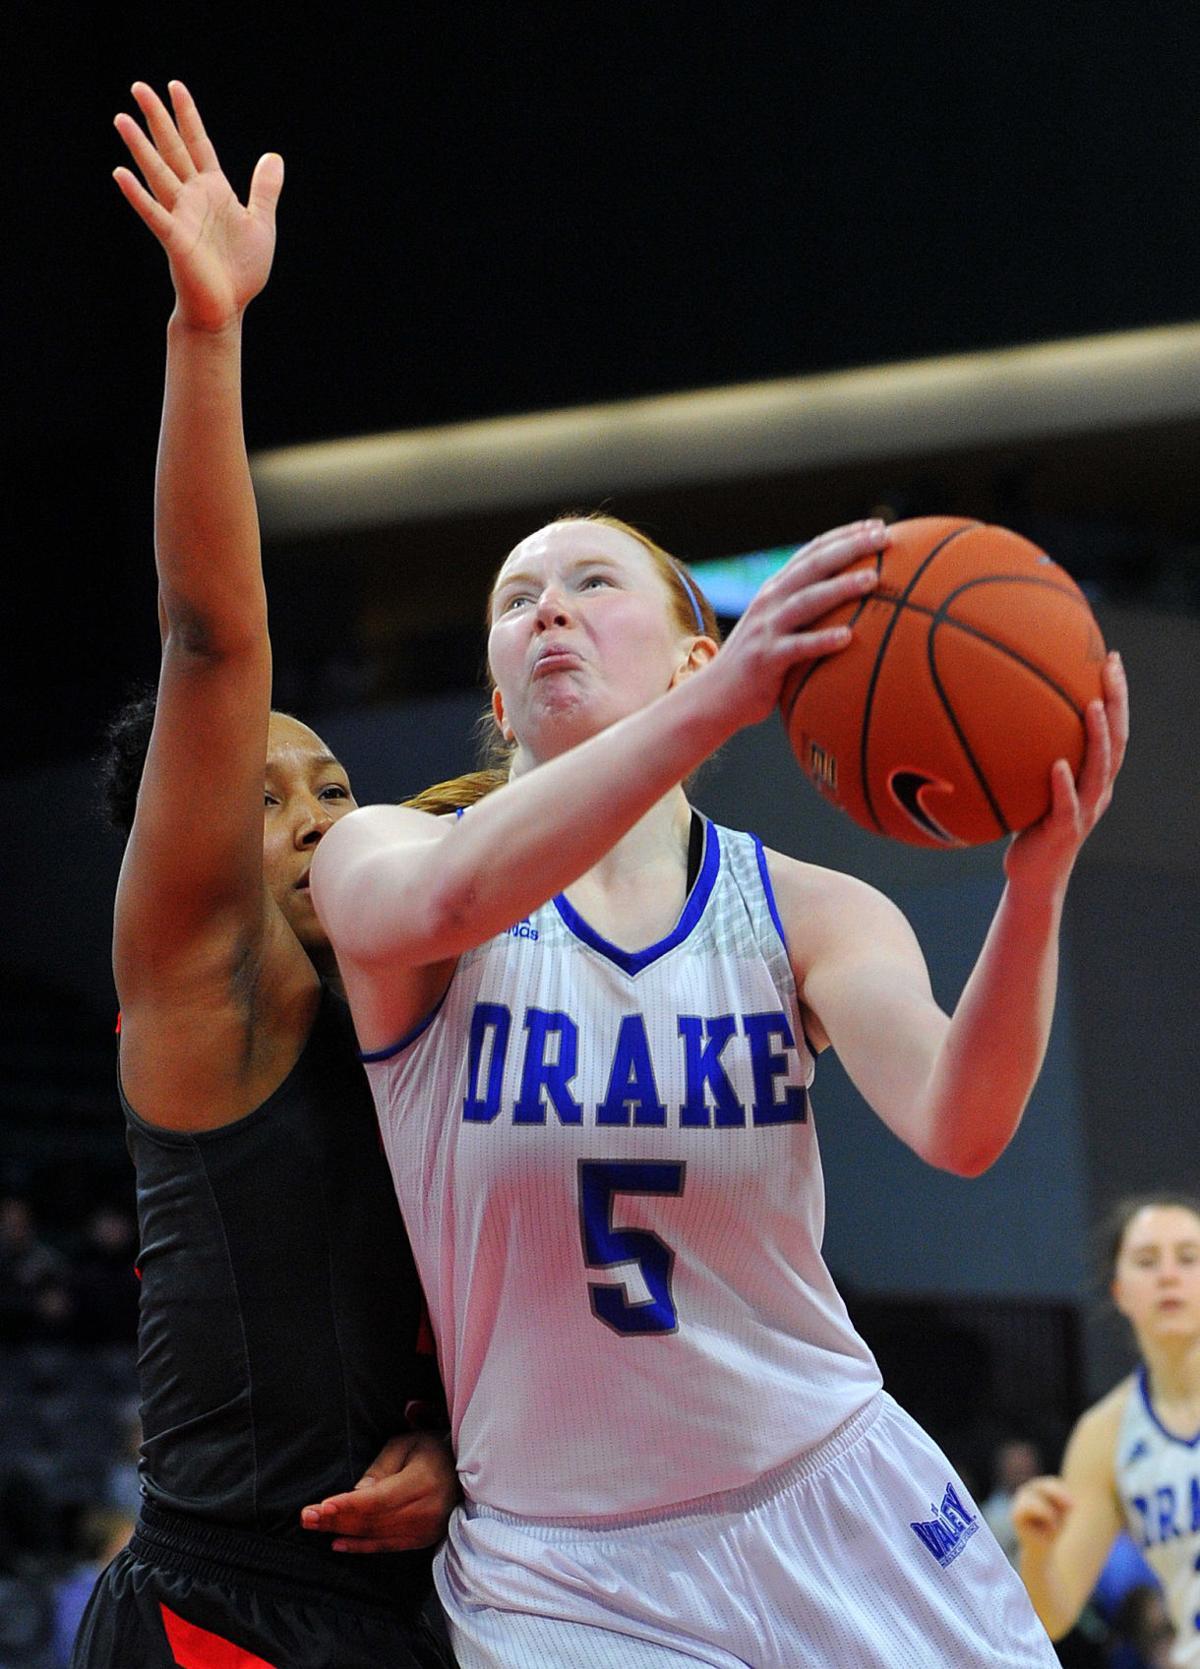 Drake vs Illinois State at the 2019 Missouri Valley Conference Women's Basketball Tournament